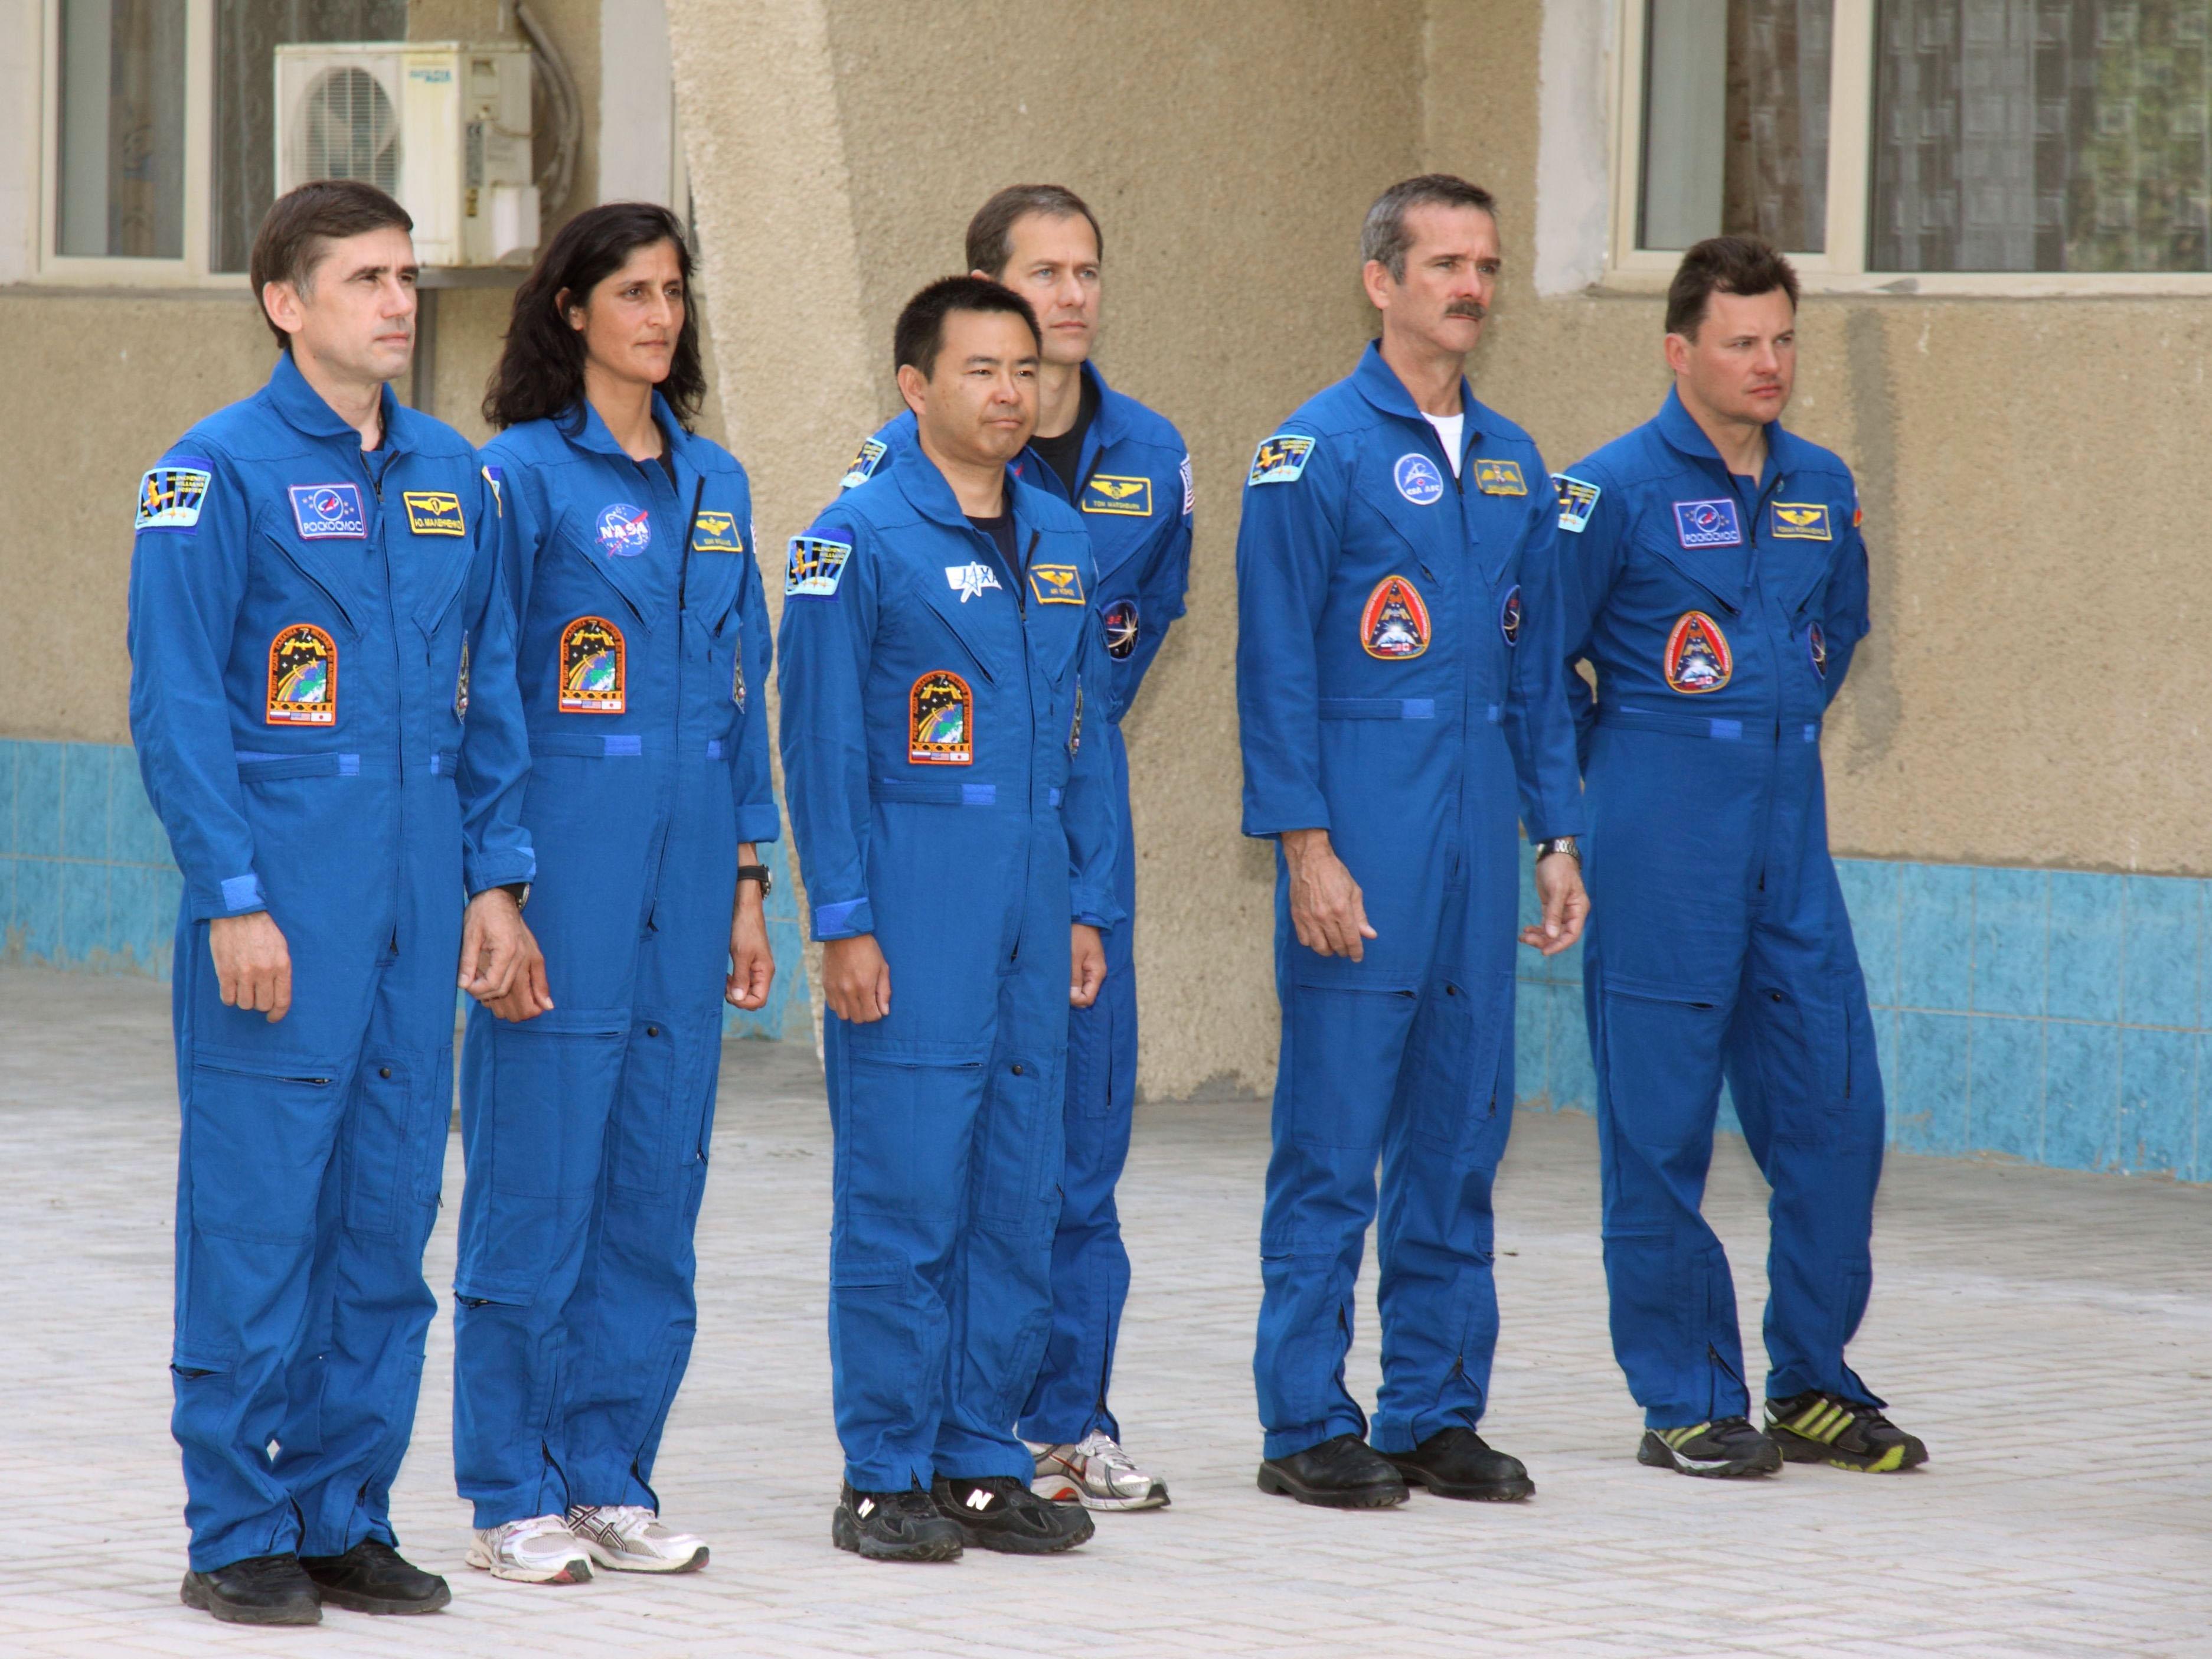 Crew Members Attend Ceremonies